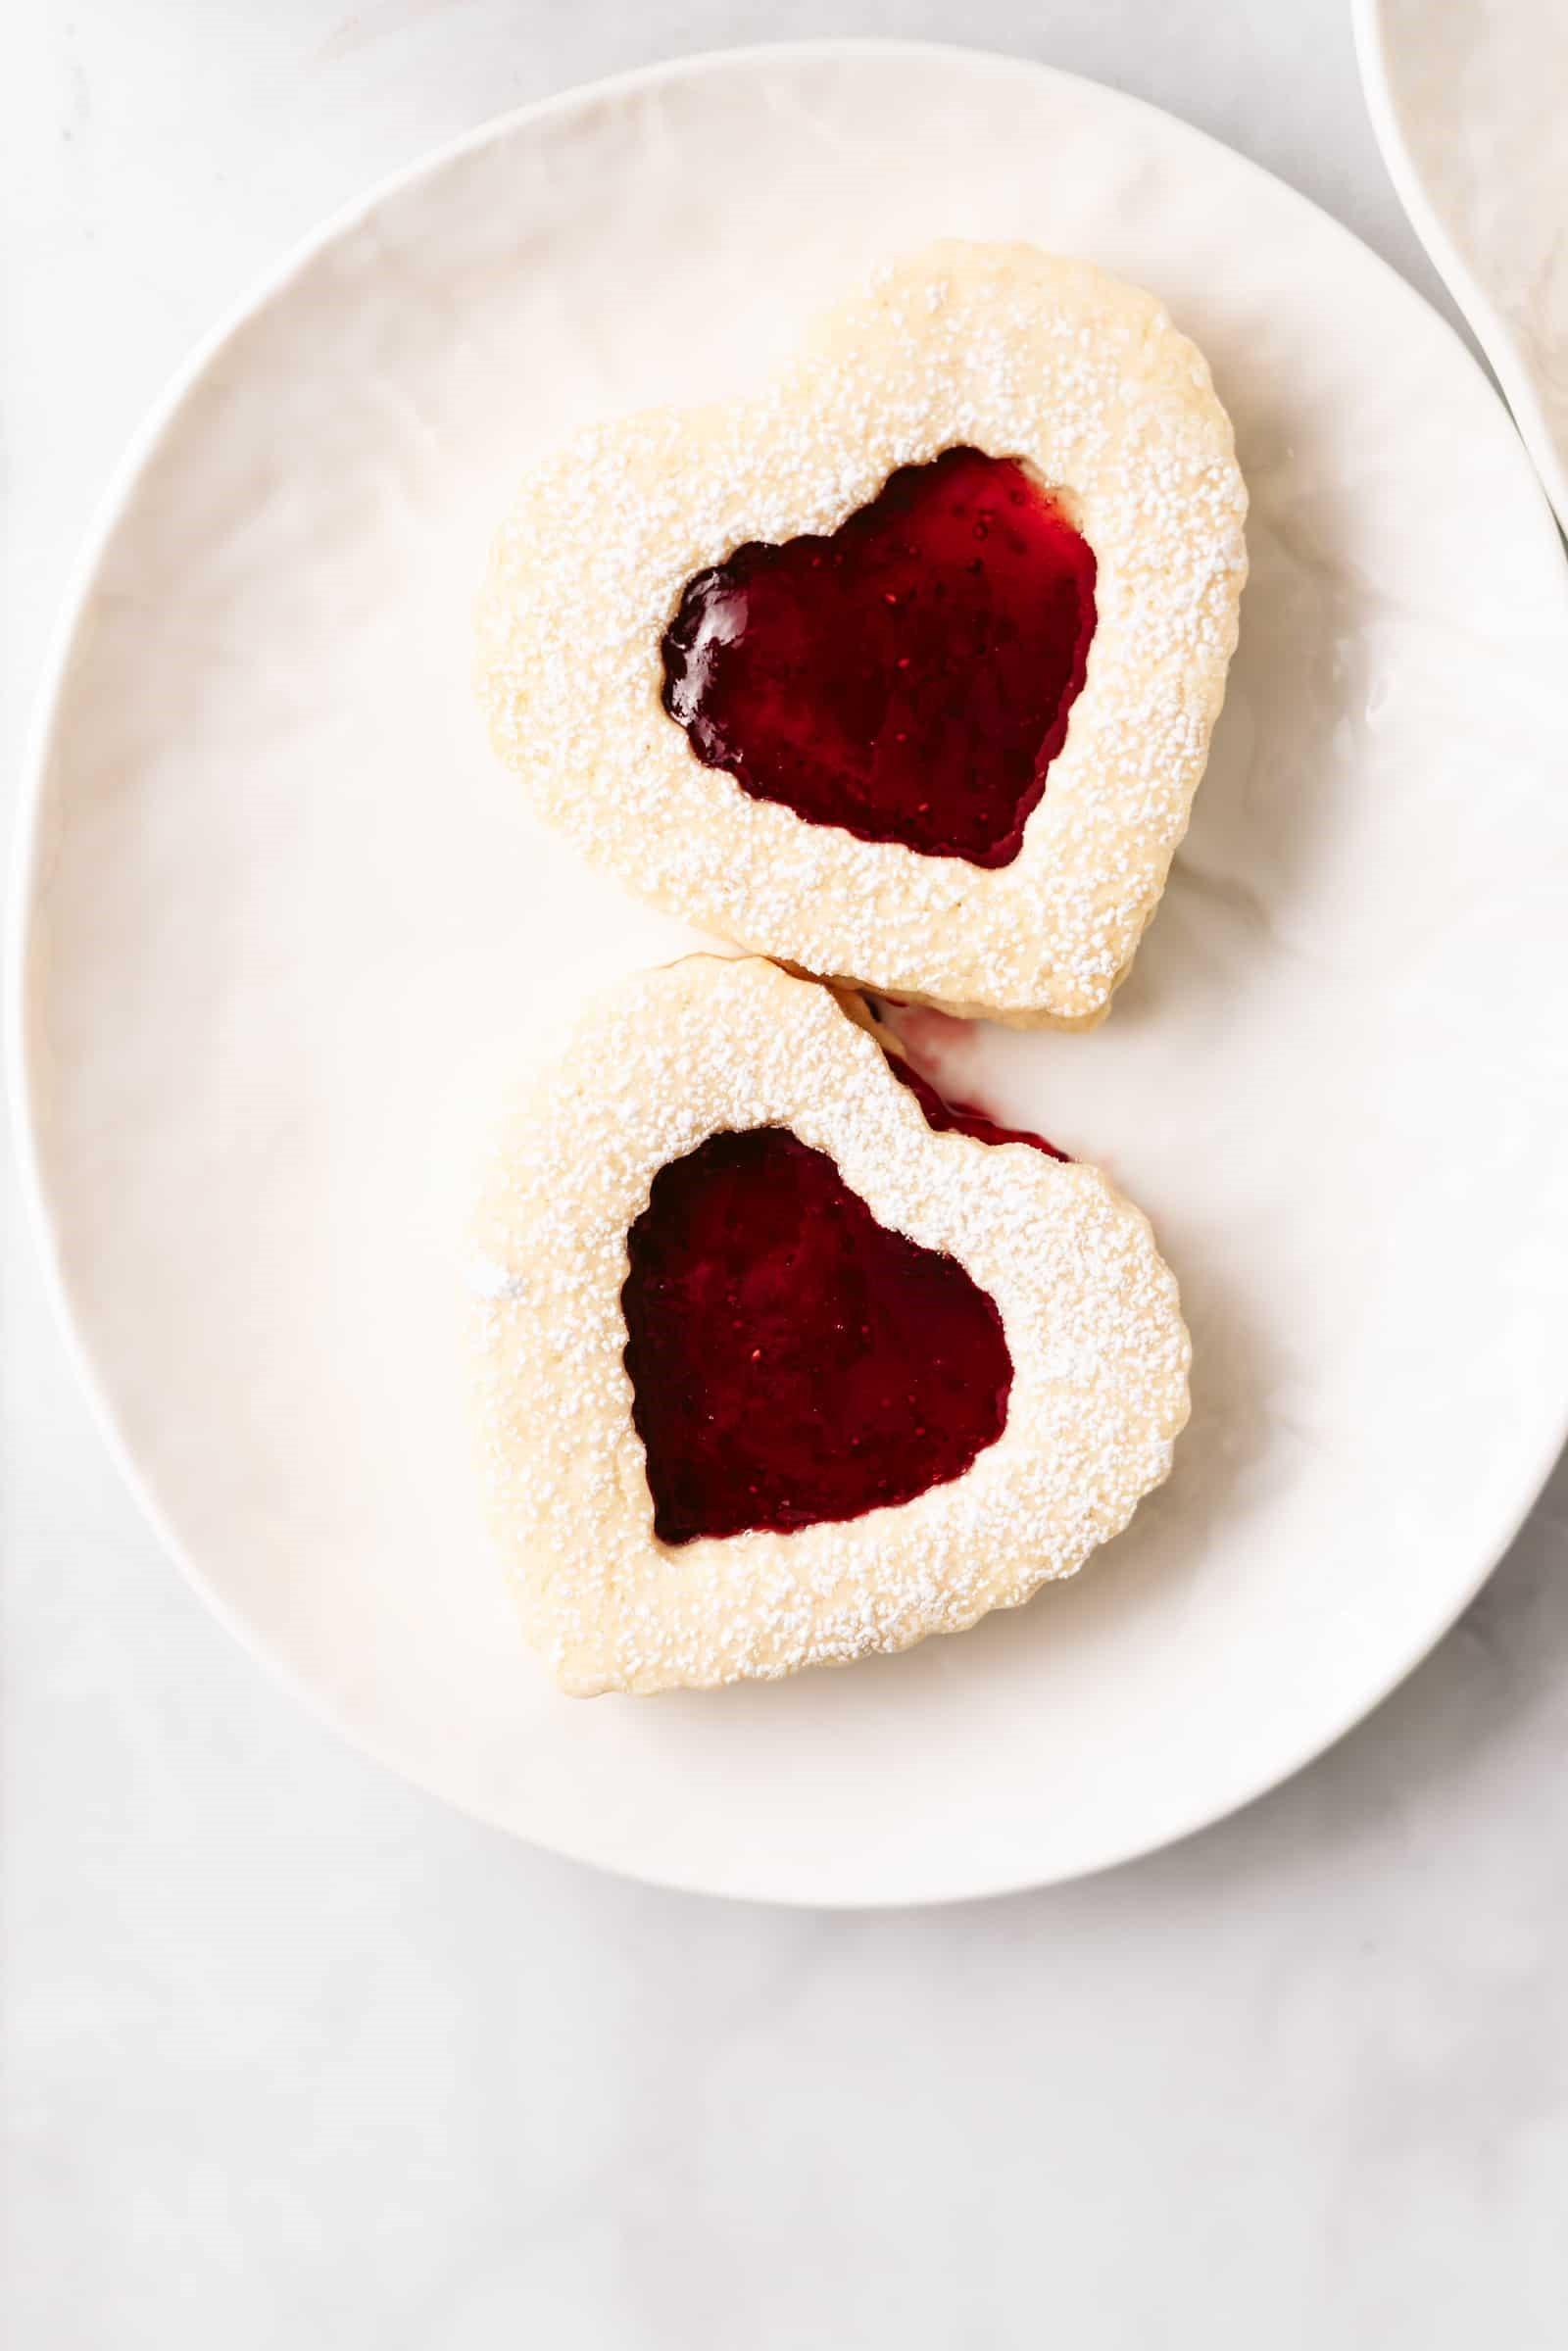 Biscuits en forme de coeur.